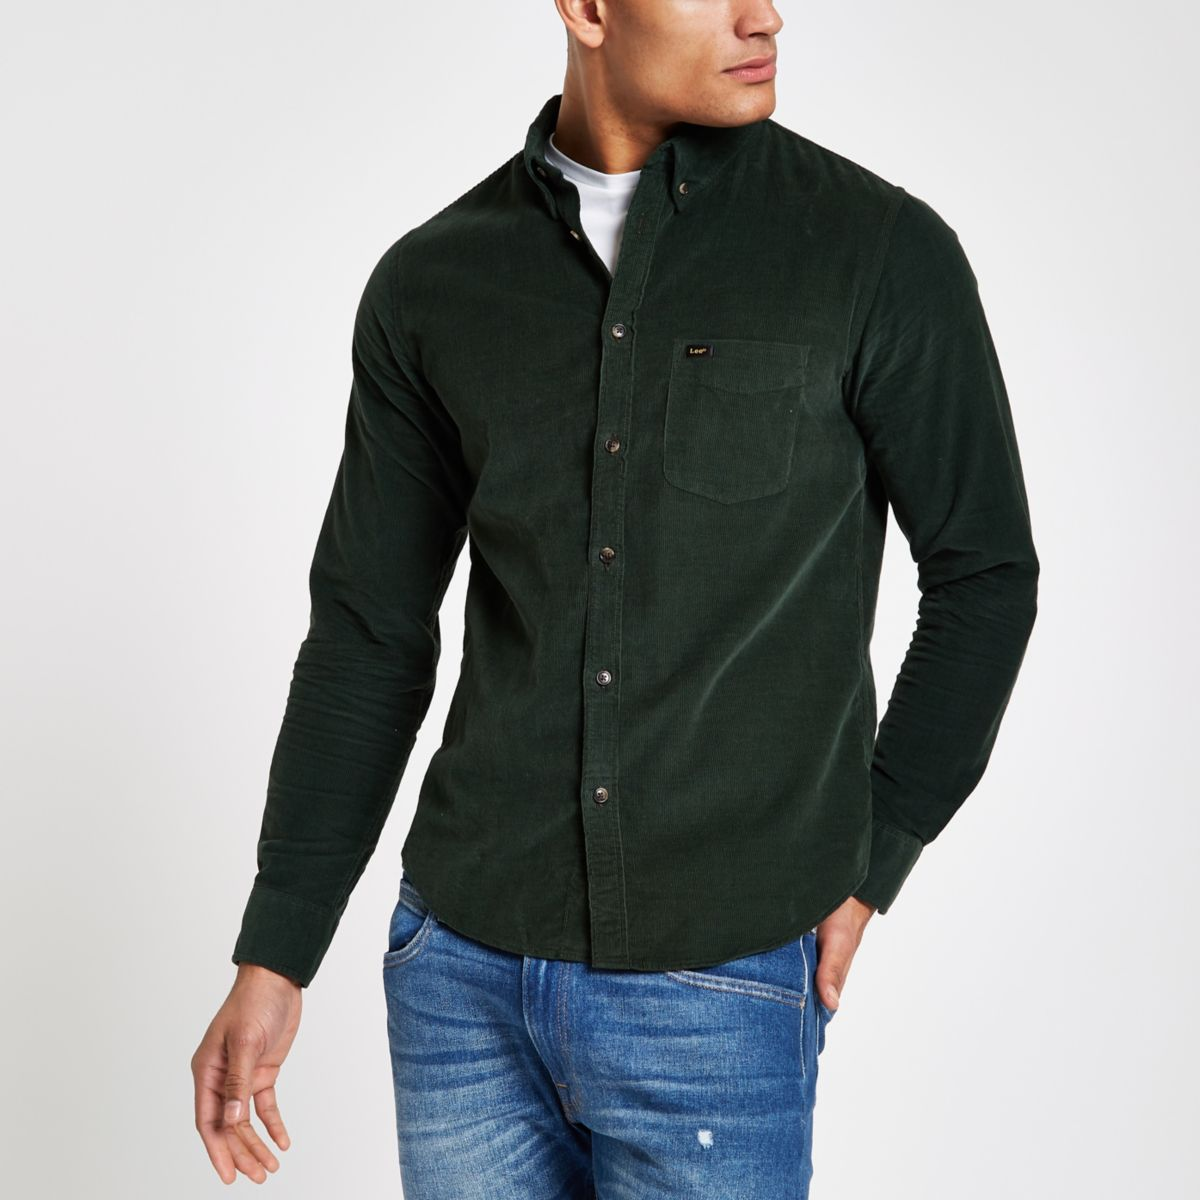 Lee green long sleeve cord shirt